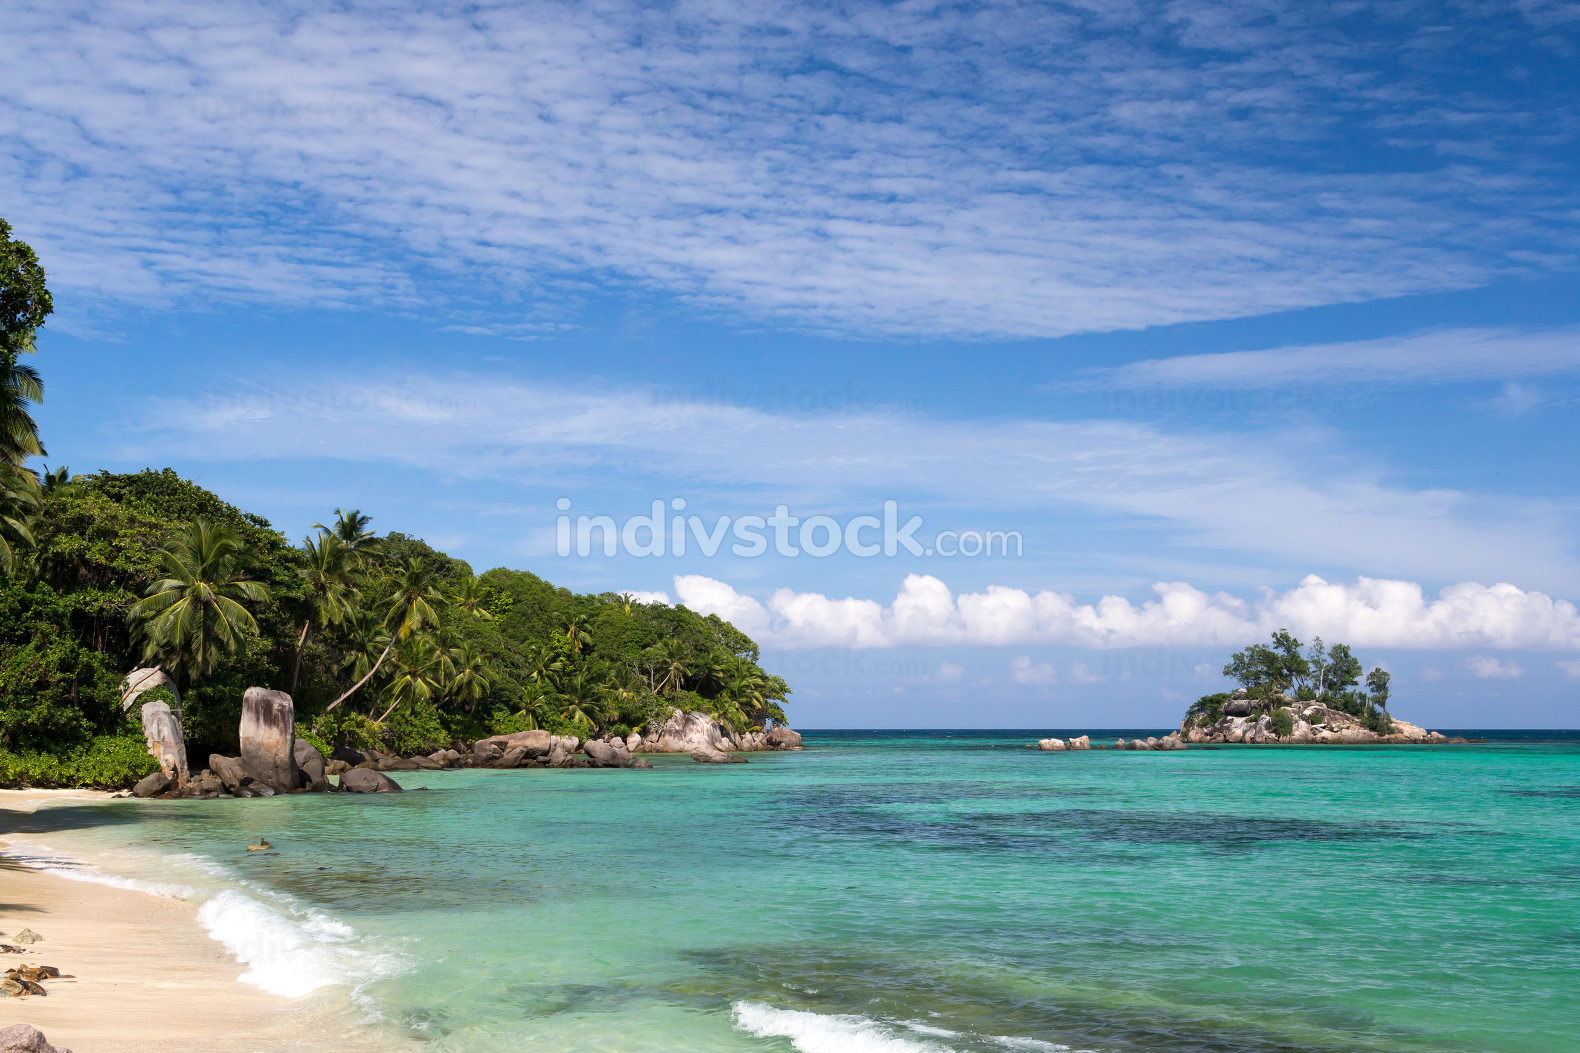 beach with a small island in the near, Seychelles